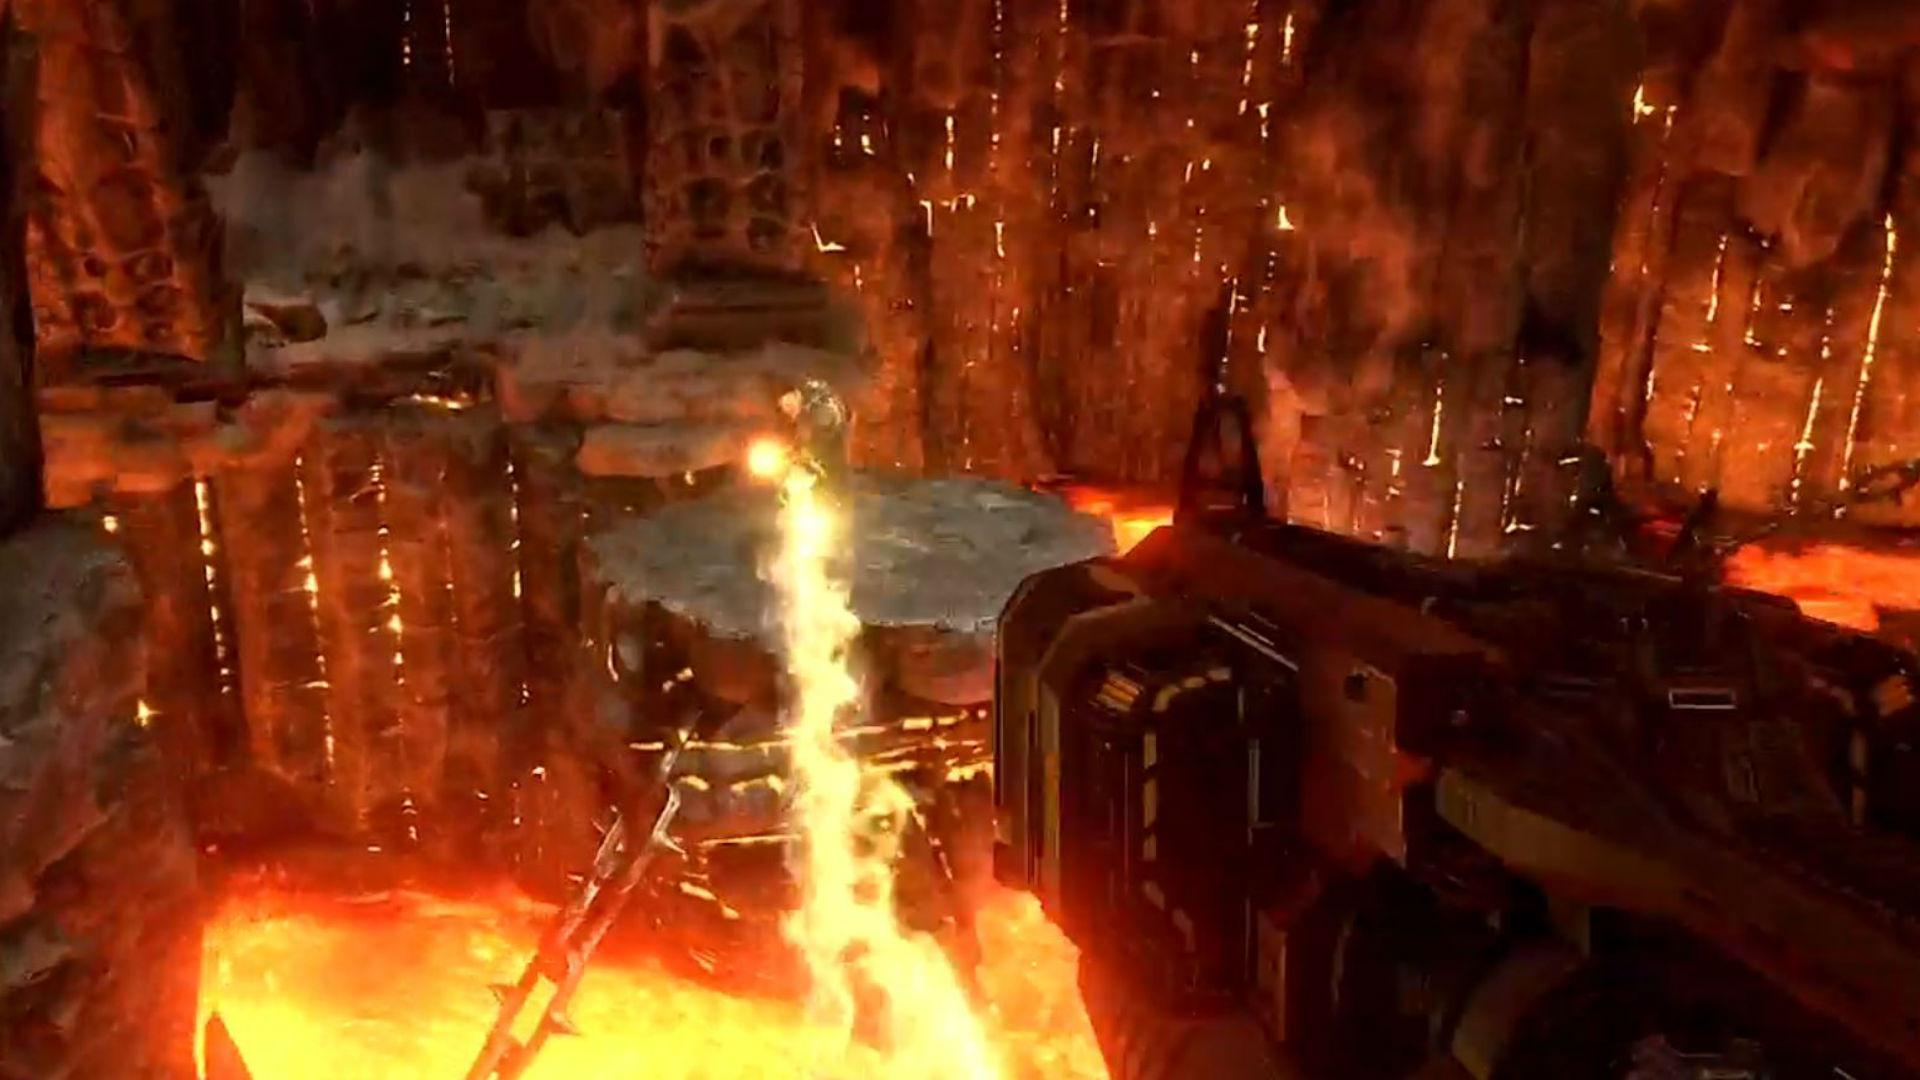 Enjoy 30 seconds of Doom Eternal's soundtrack featuring its